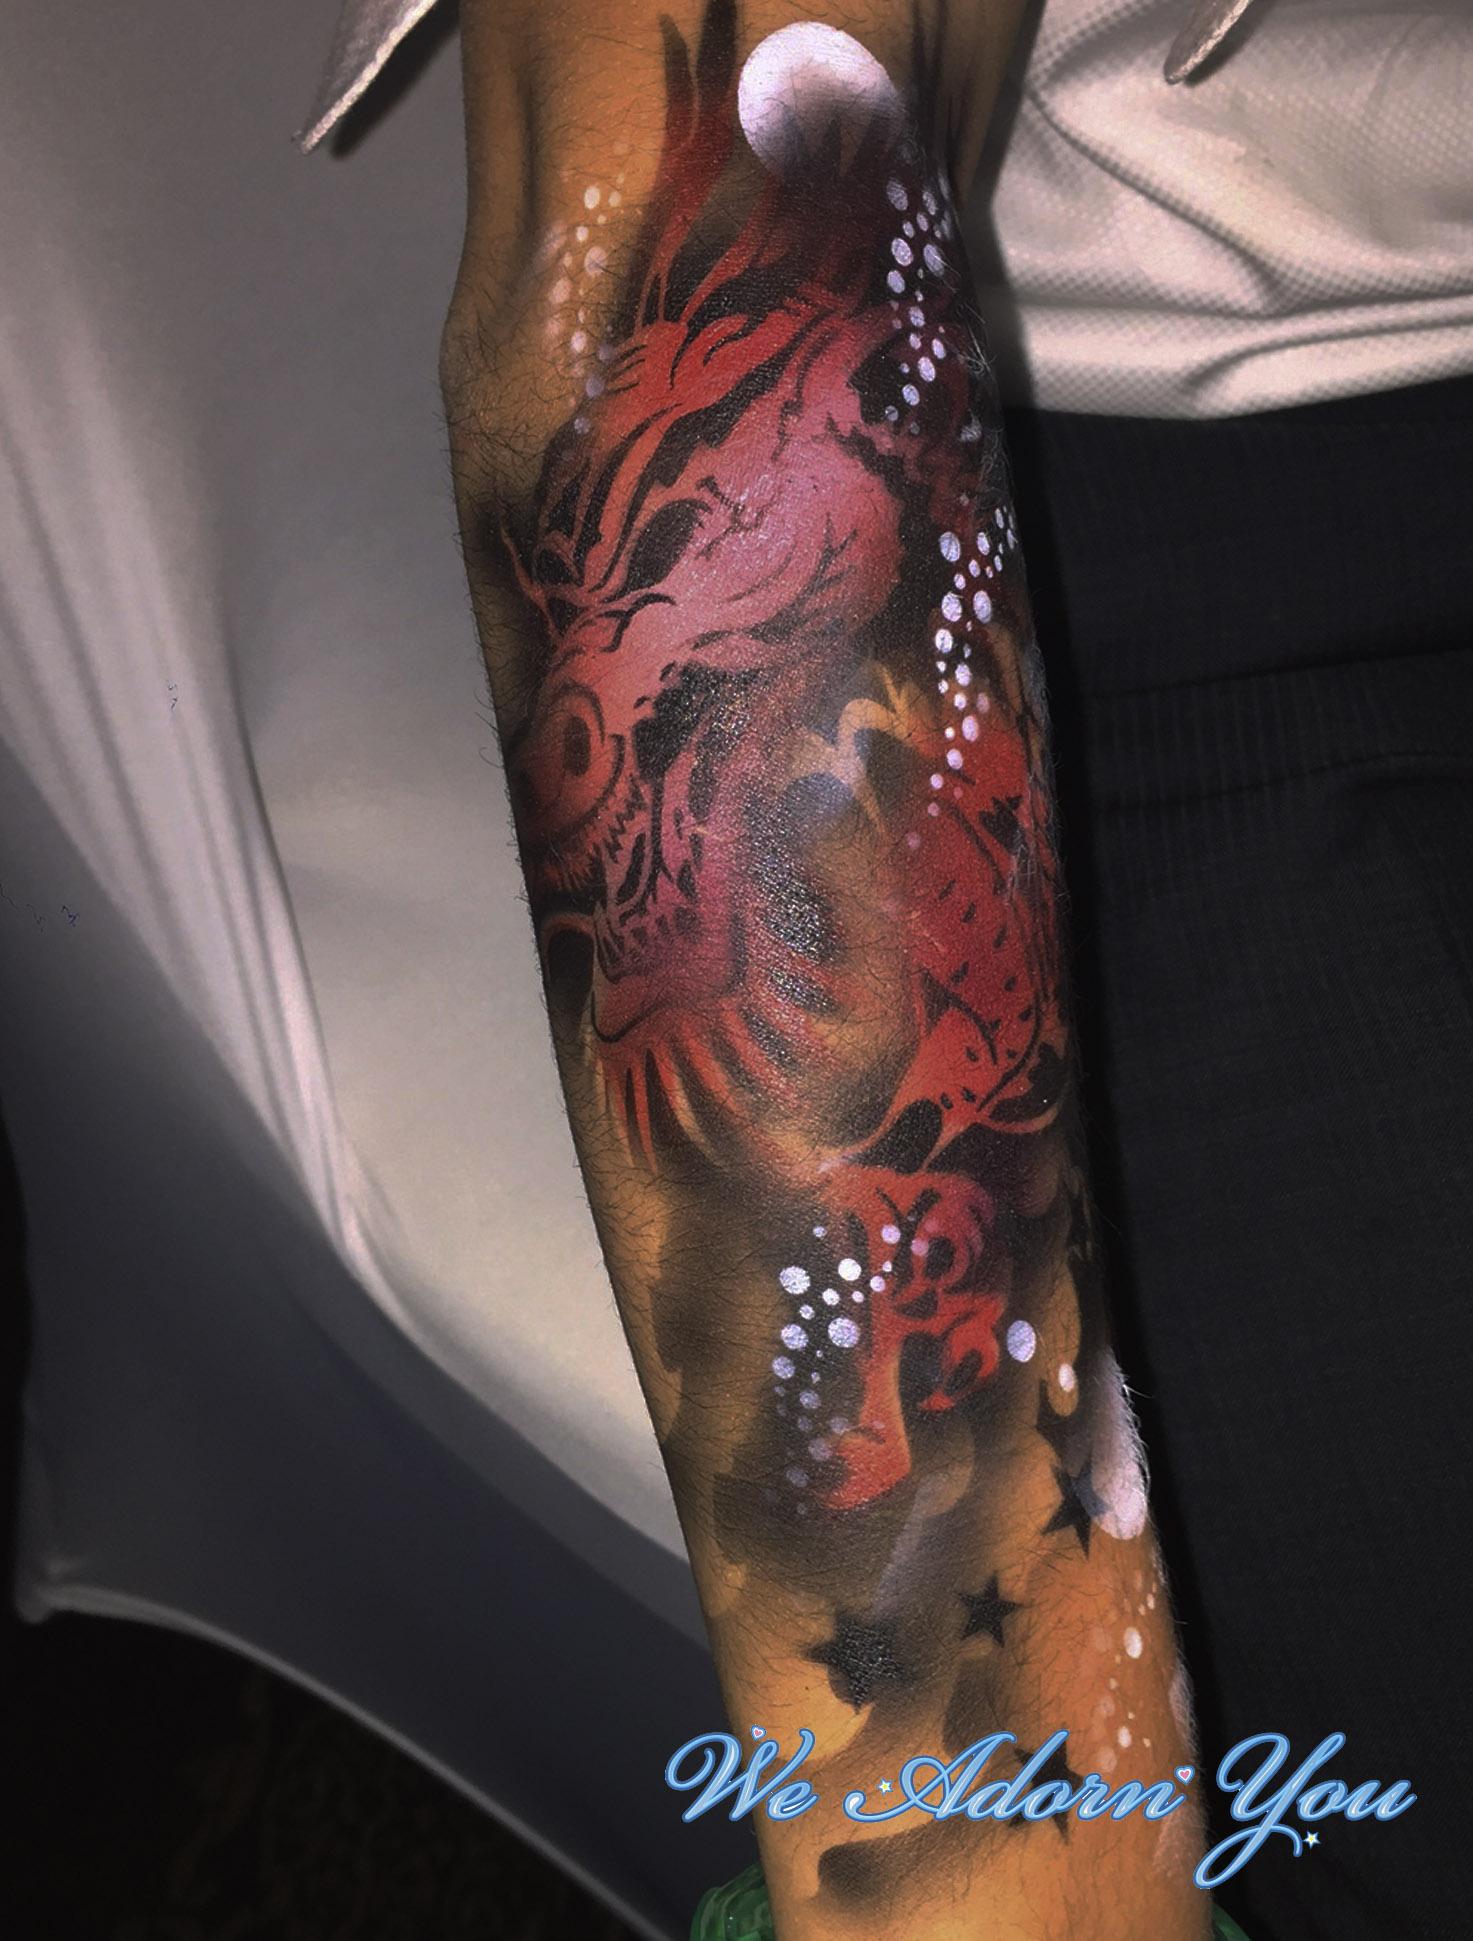 Premium Airbrush Tattoo Dragon - We Adorn You.jpg